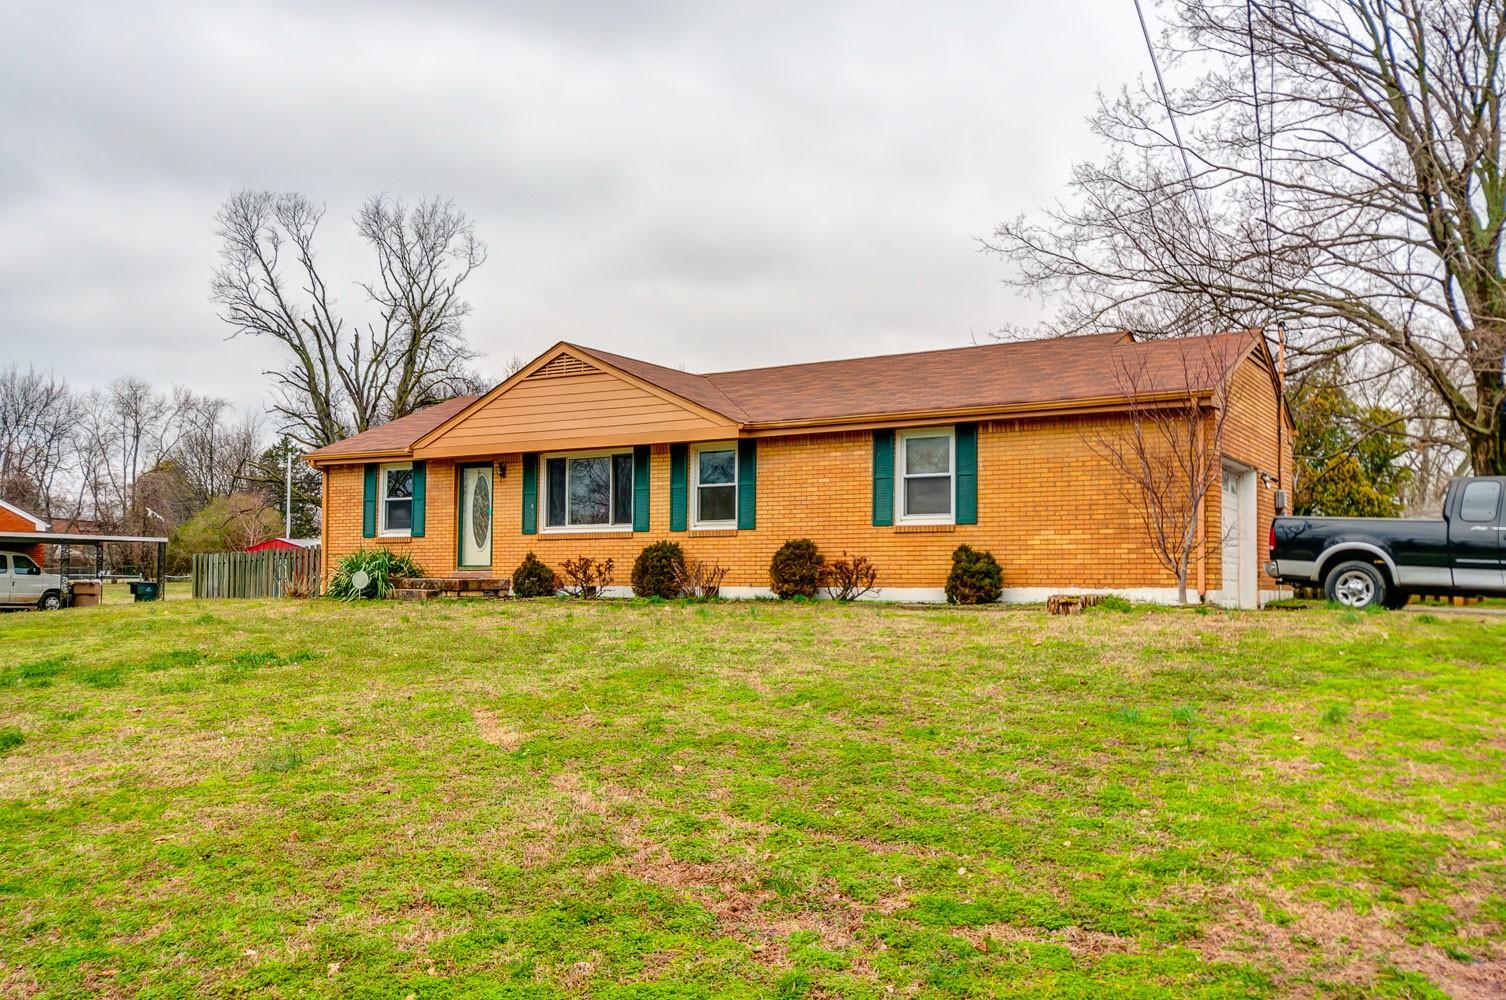 386 Ocala Dr, Nashville, TN 37211 - Nashville, TN real estate listing